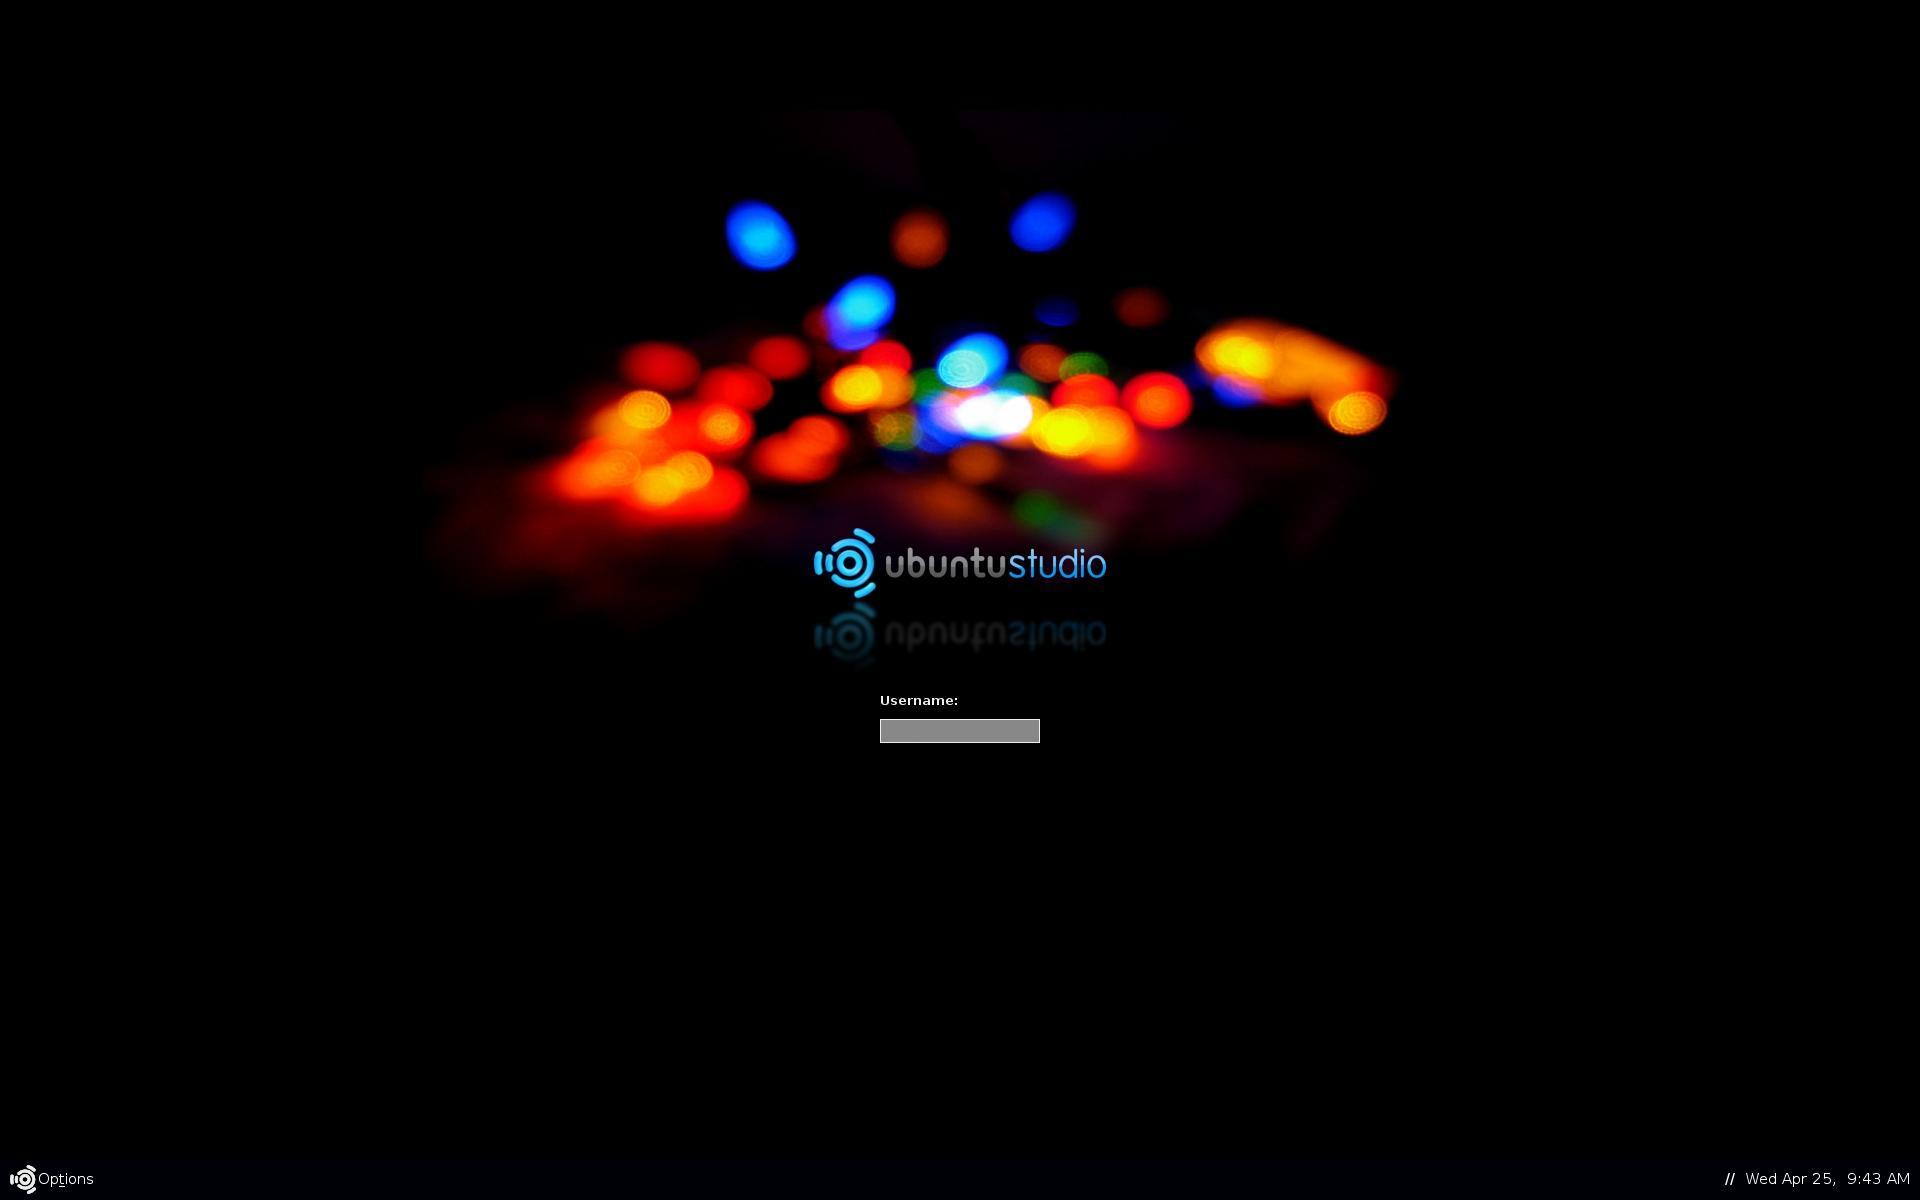 Ubuntu Desktop Logo Themes Ofertas Studio Backgrounds Intrepid HD 1920x1200